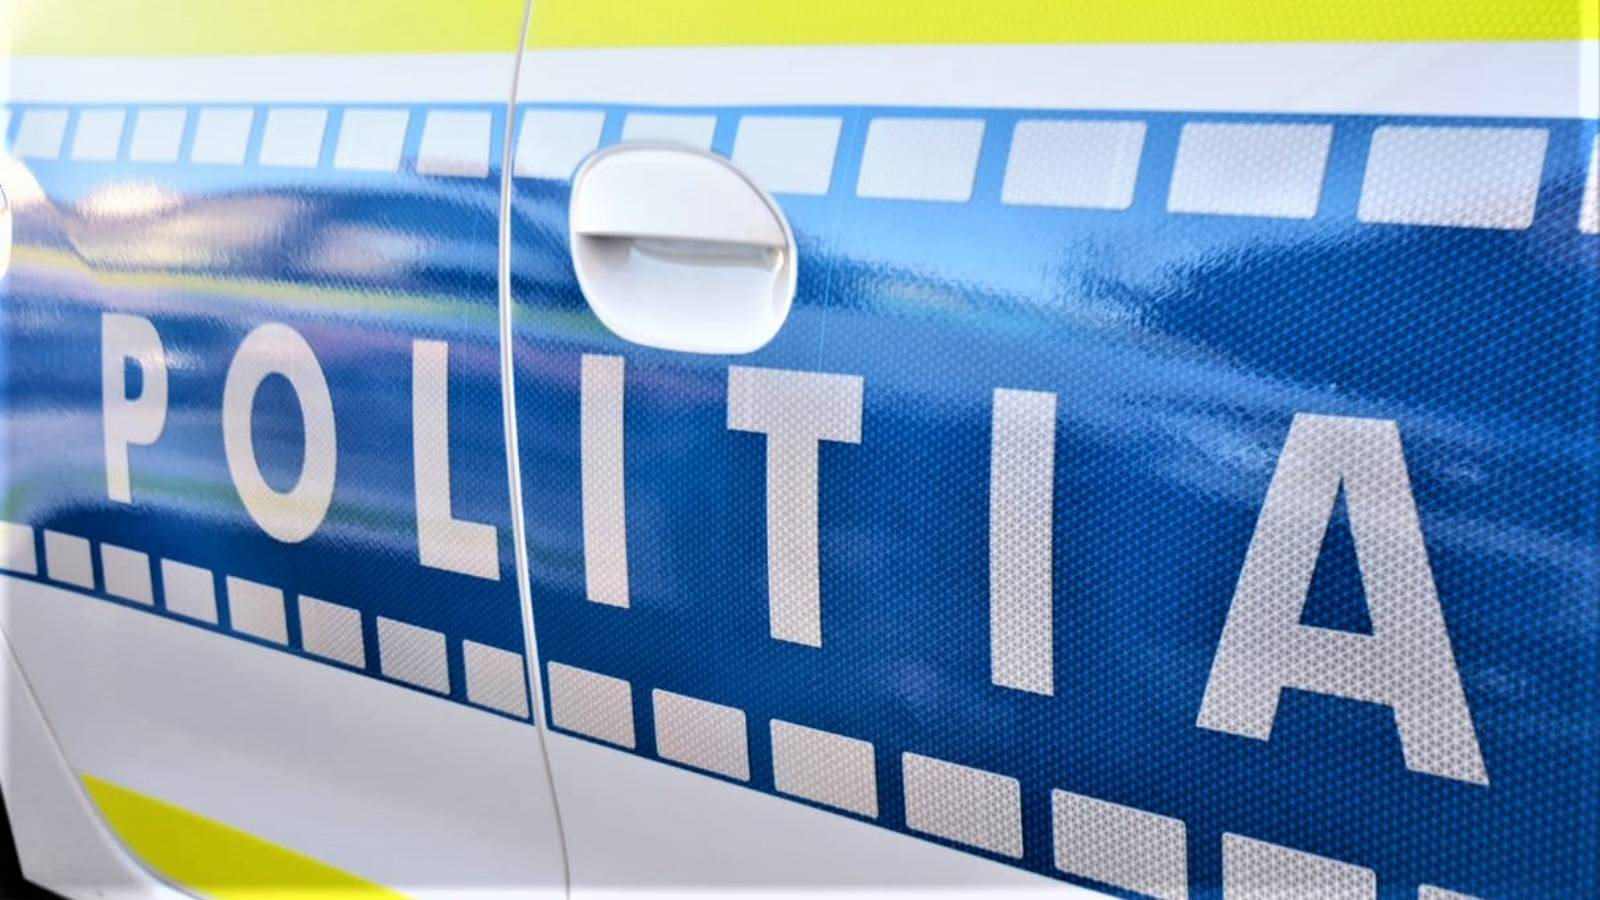 ATENTIONAREA politia romana viteza marte